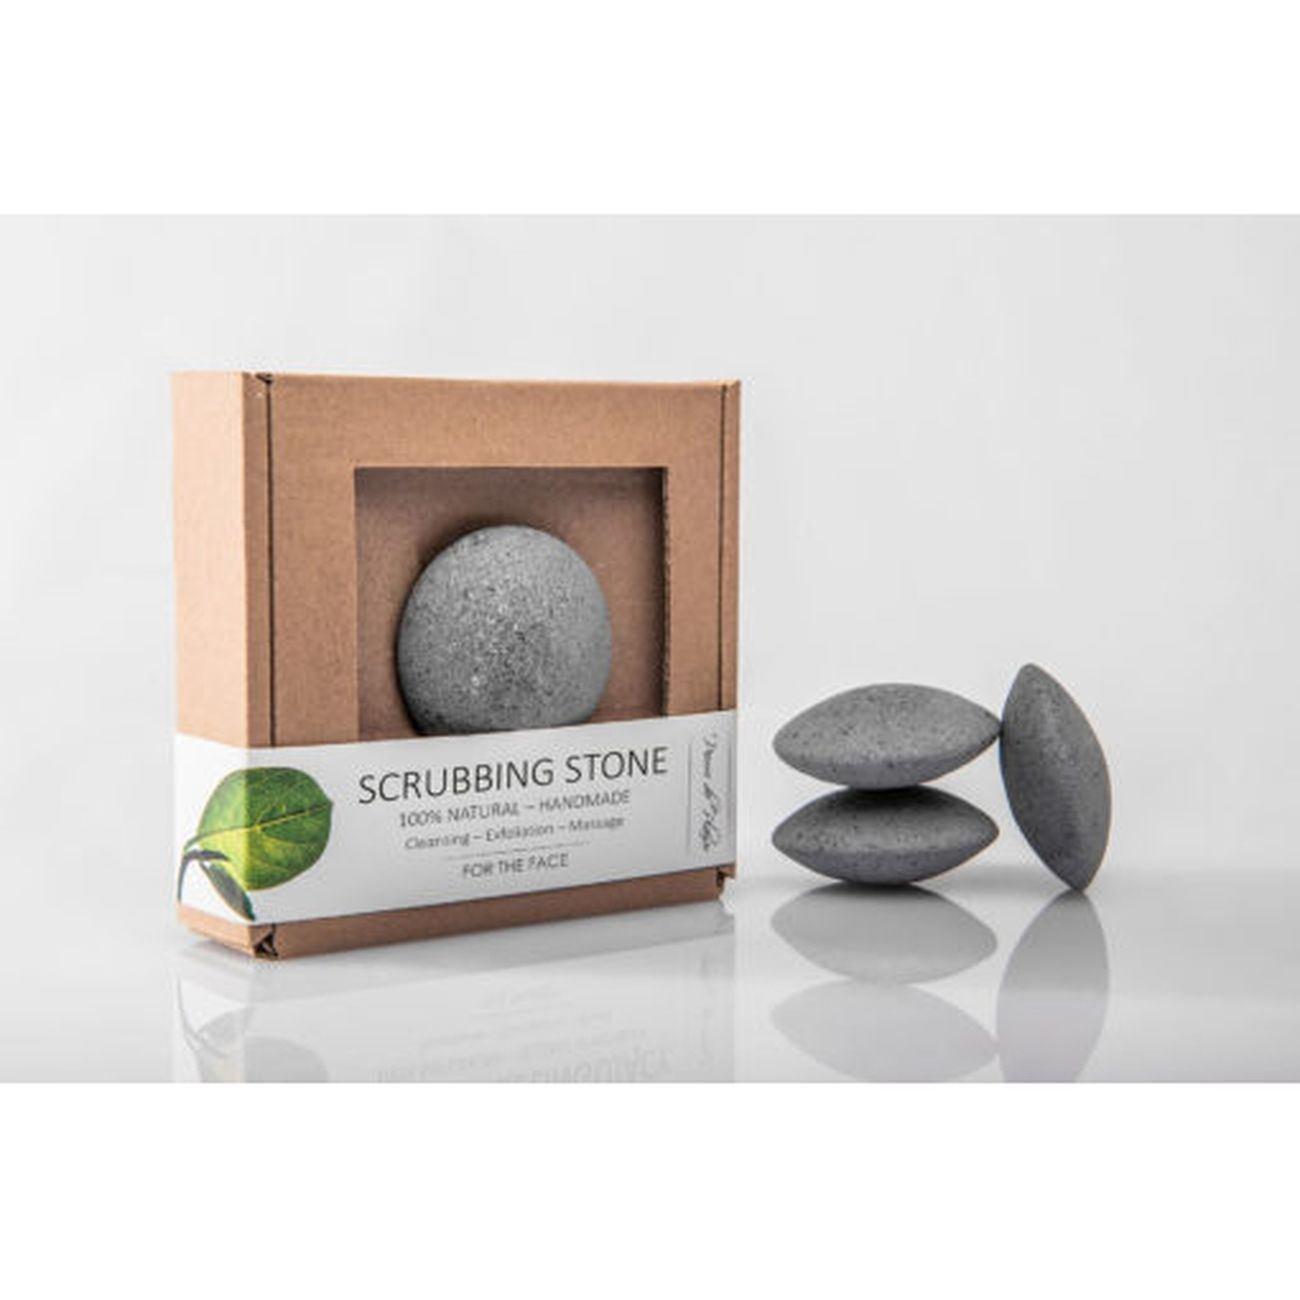 Pierre de Plaisir - Natural Scrubbing Stone for the Face Grey - 40g